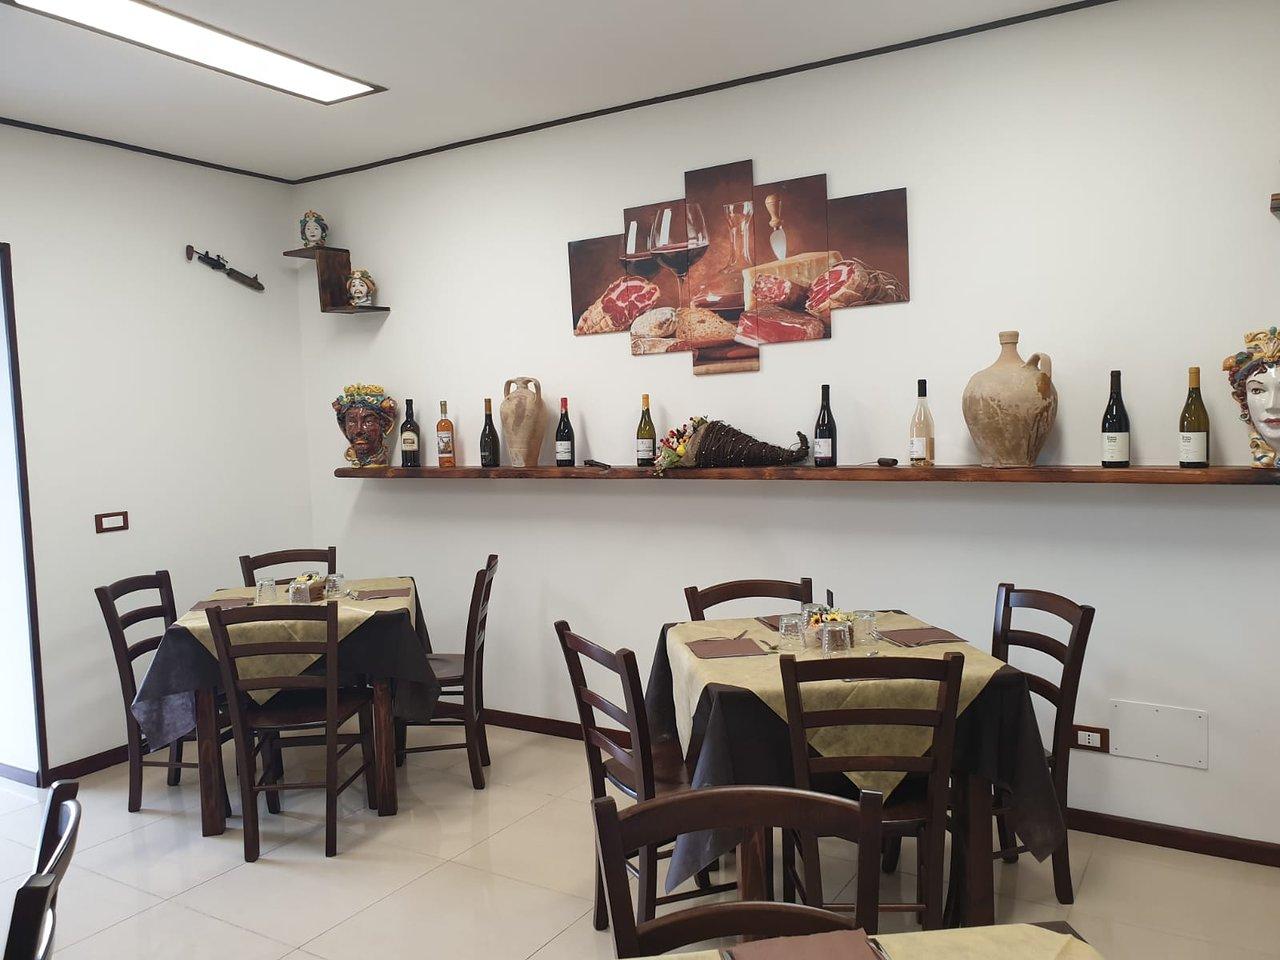 giardini naxos ristoranti economici